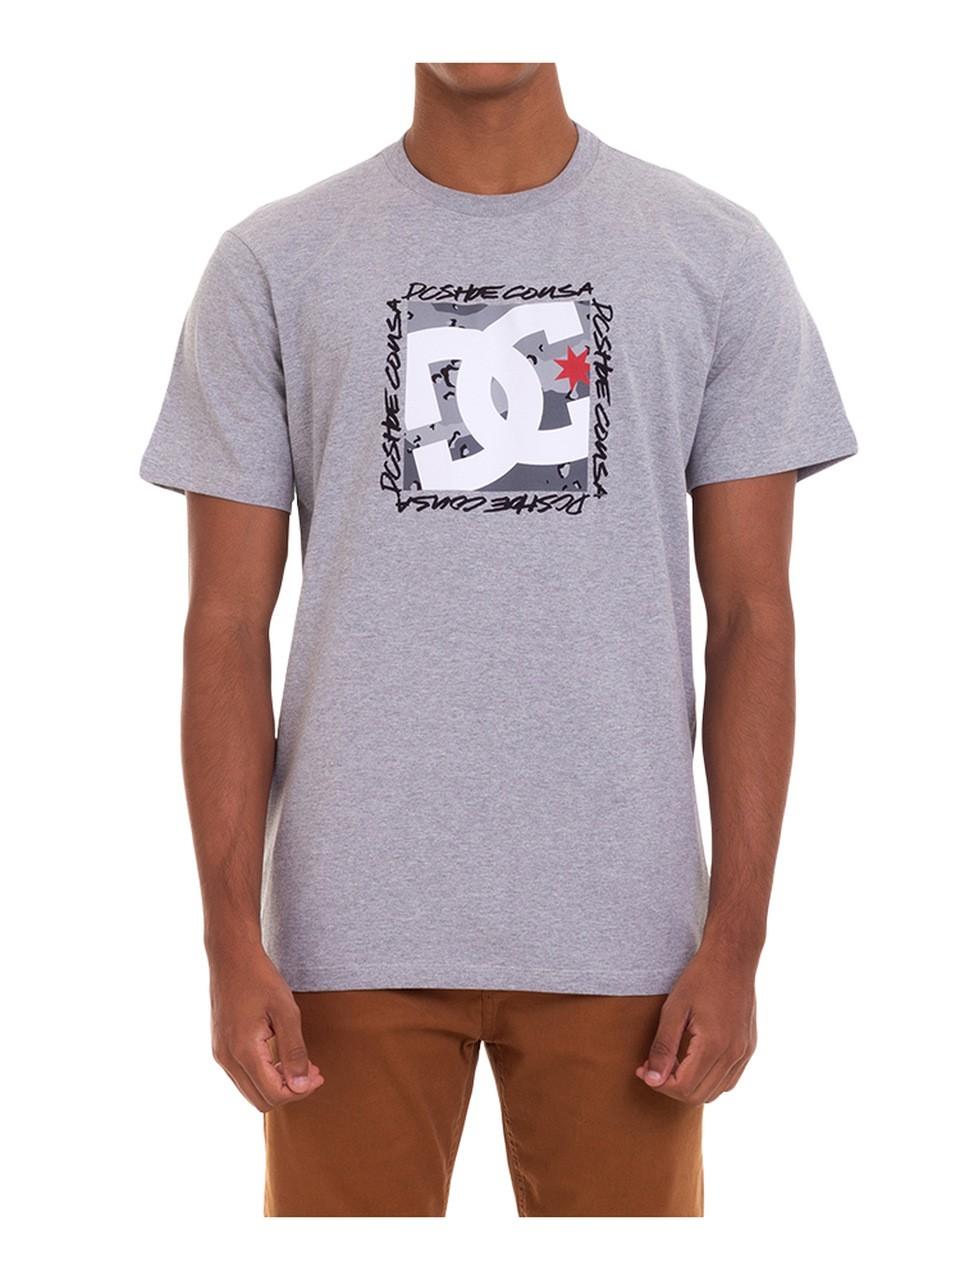 Camiseta DC Shoes Big Square Cinza Mescla